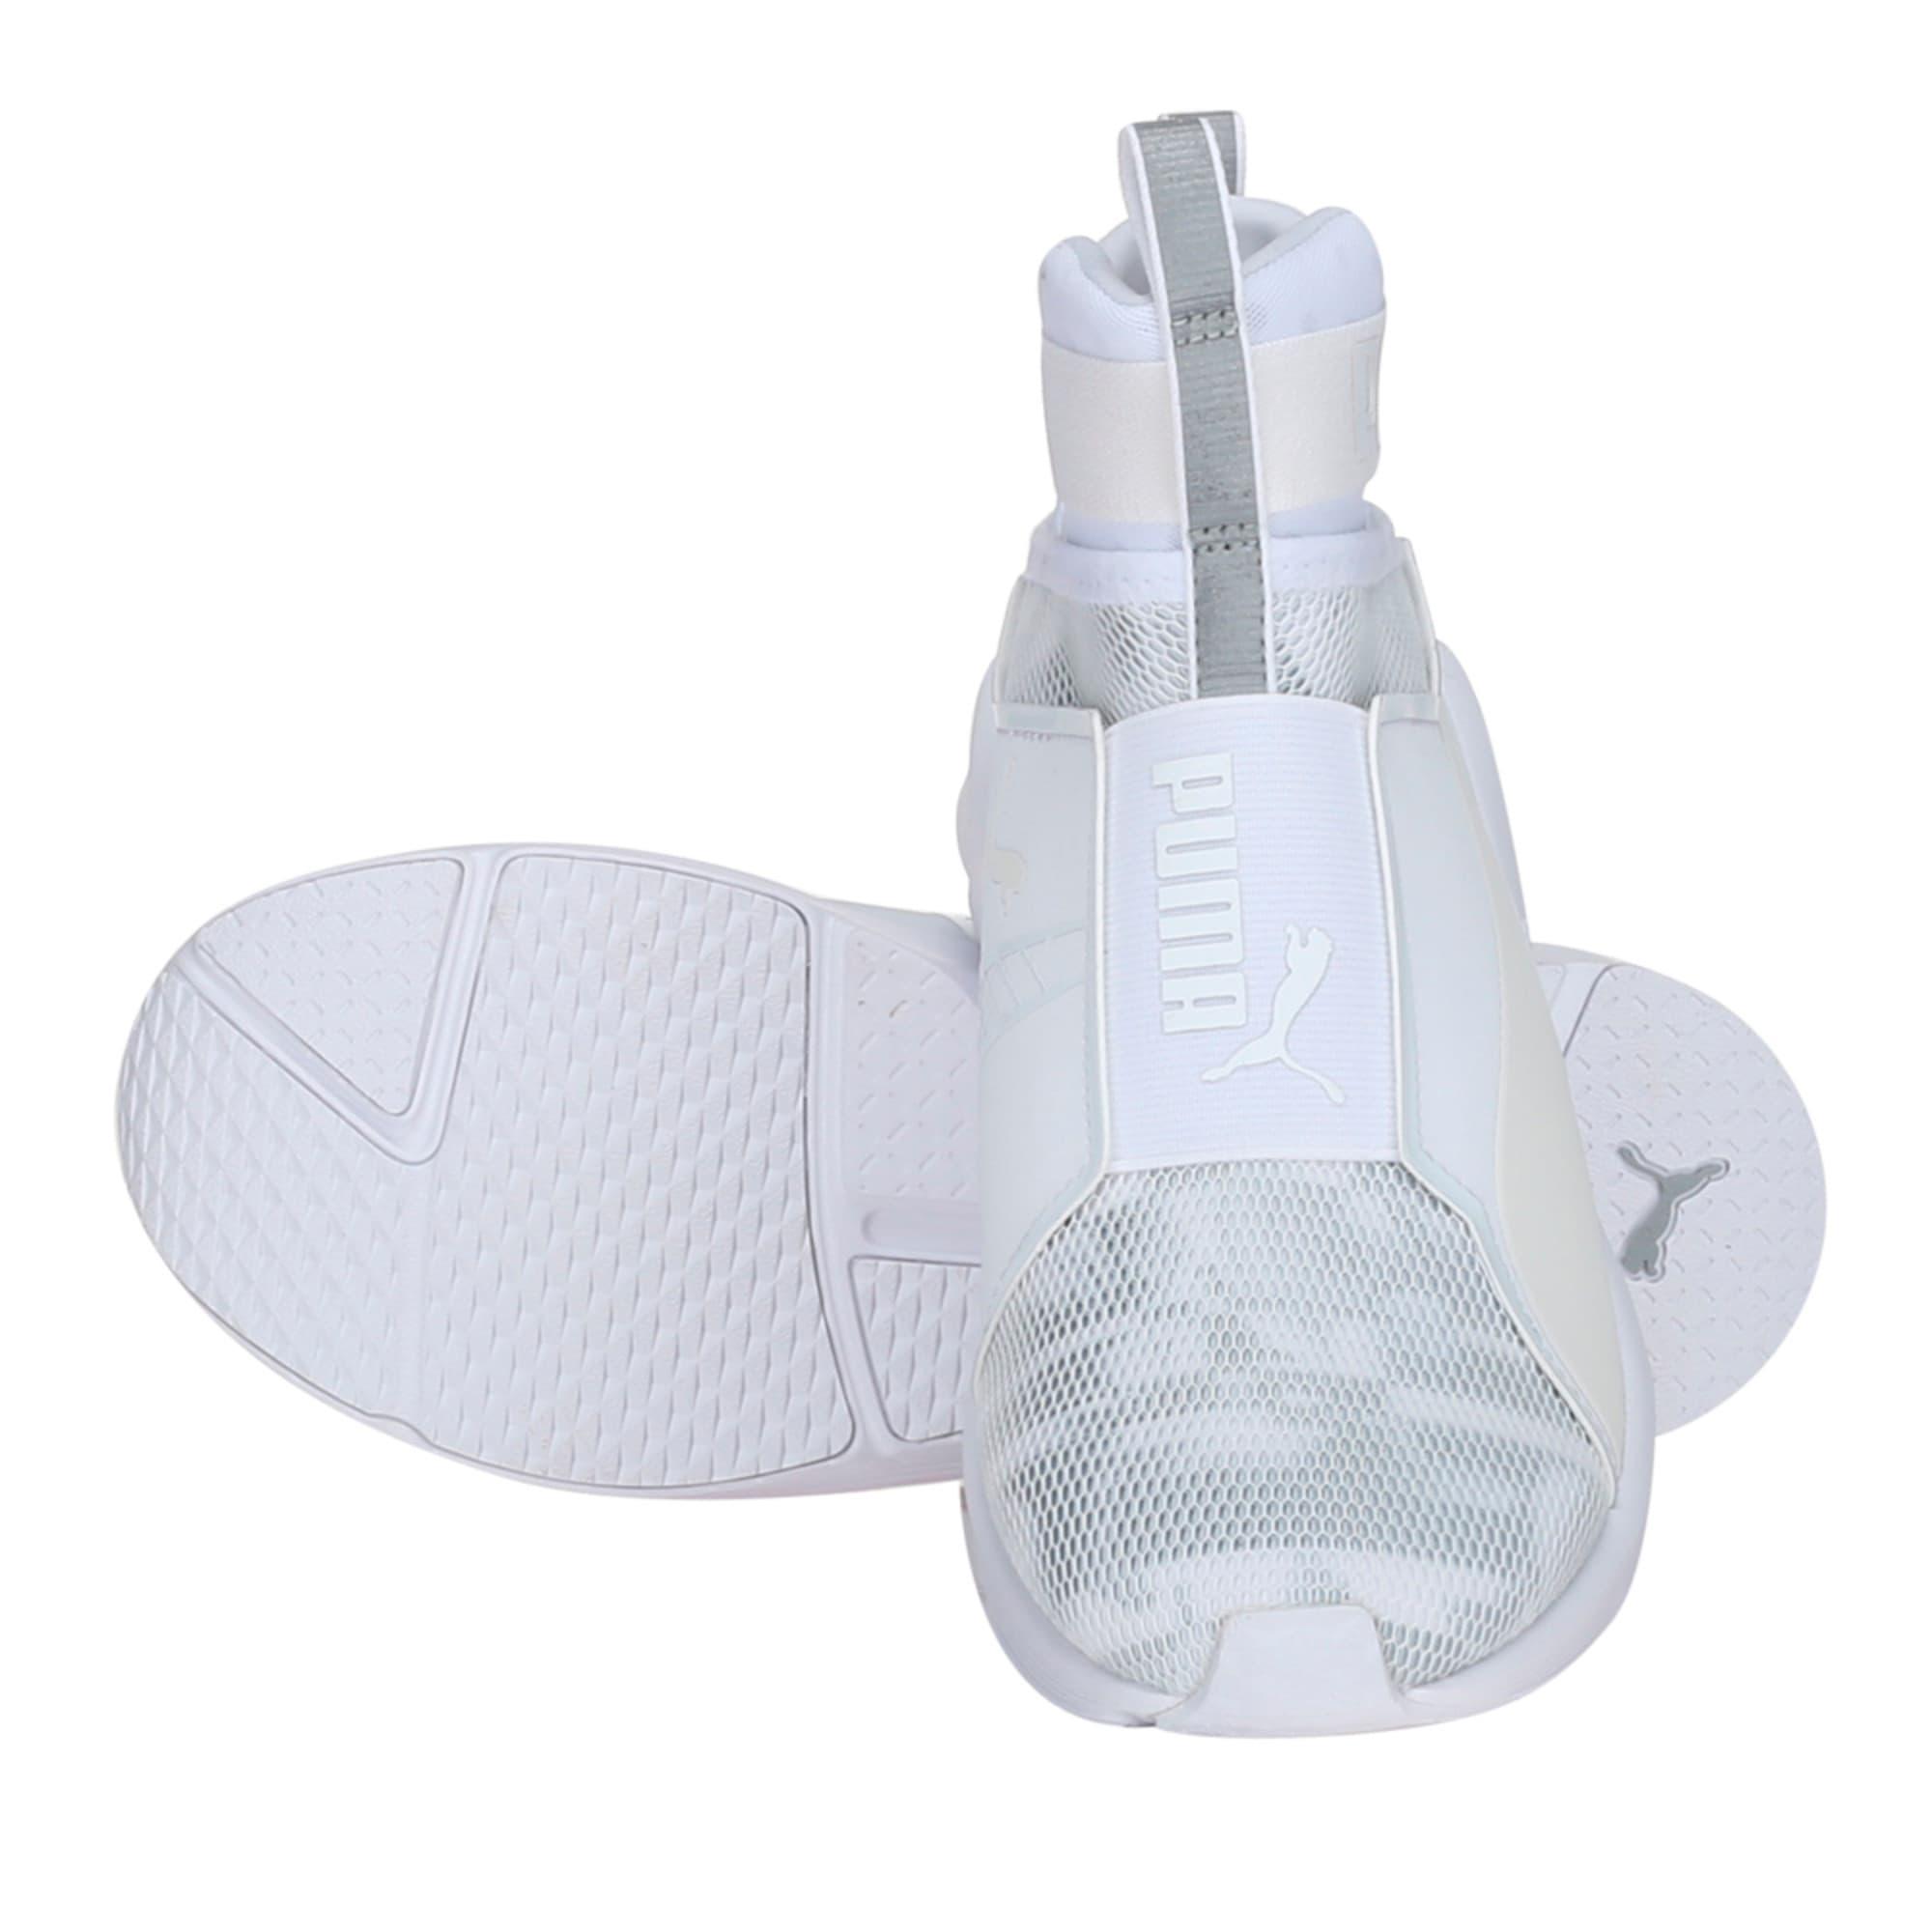 Thumbnail 2 of PUMA Fierce Swan Training Shoes, Puma White-Puma White, medium-IND